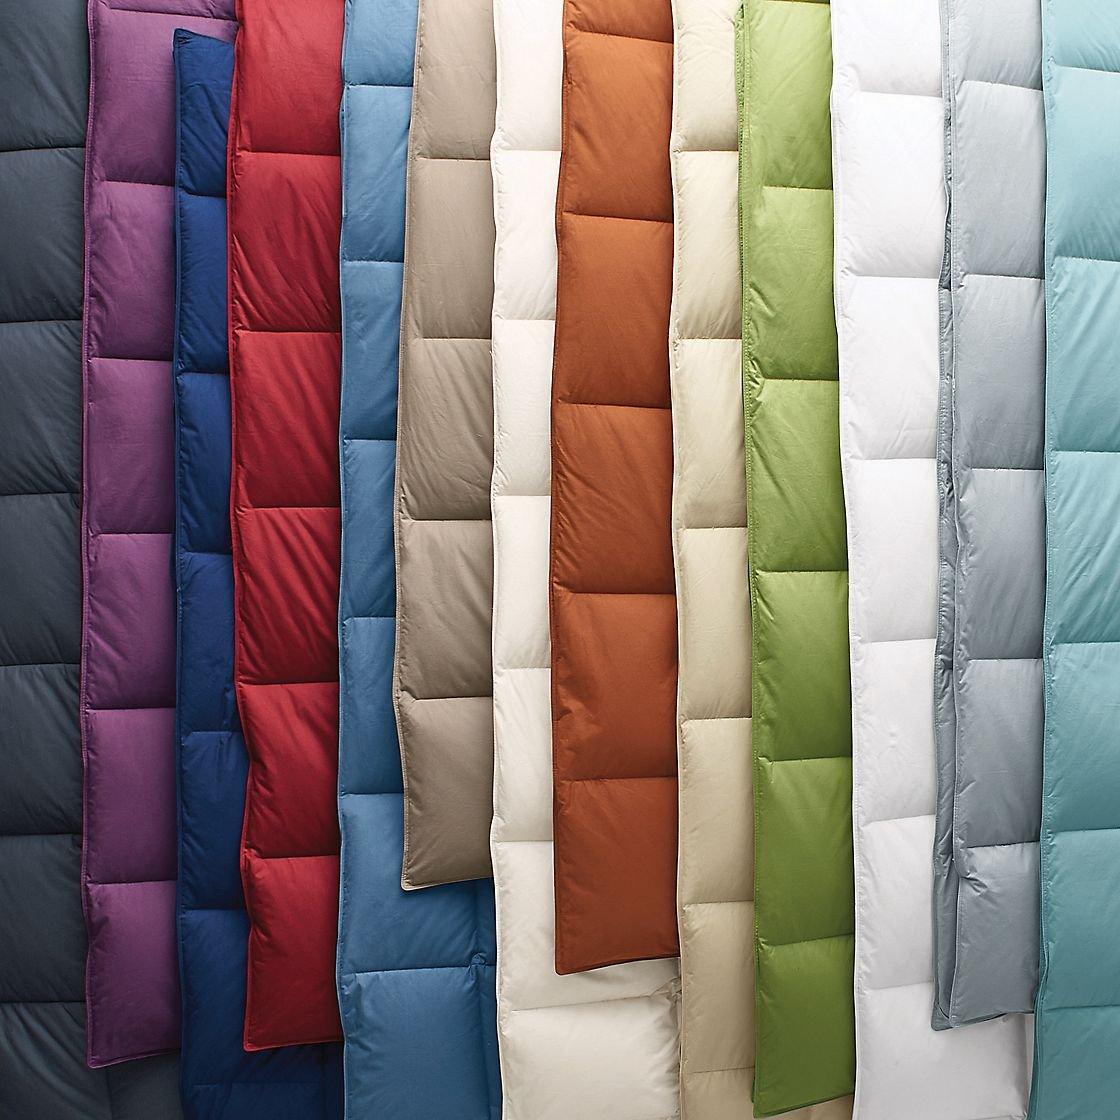 amazoncom mizone kyle 4 piece comforter set redblue fullquee